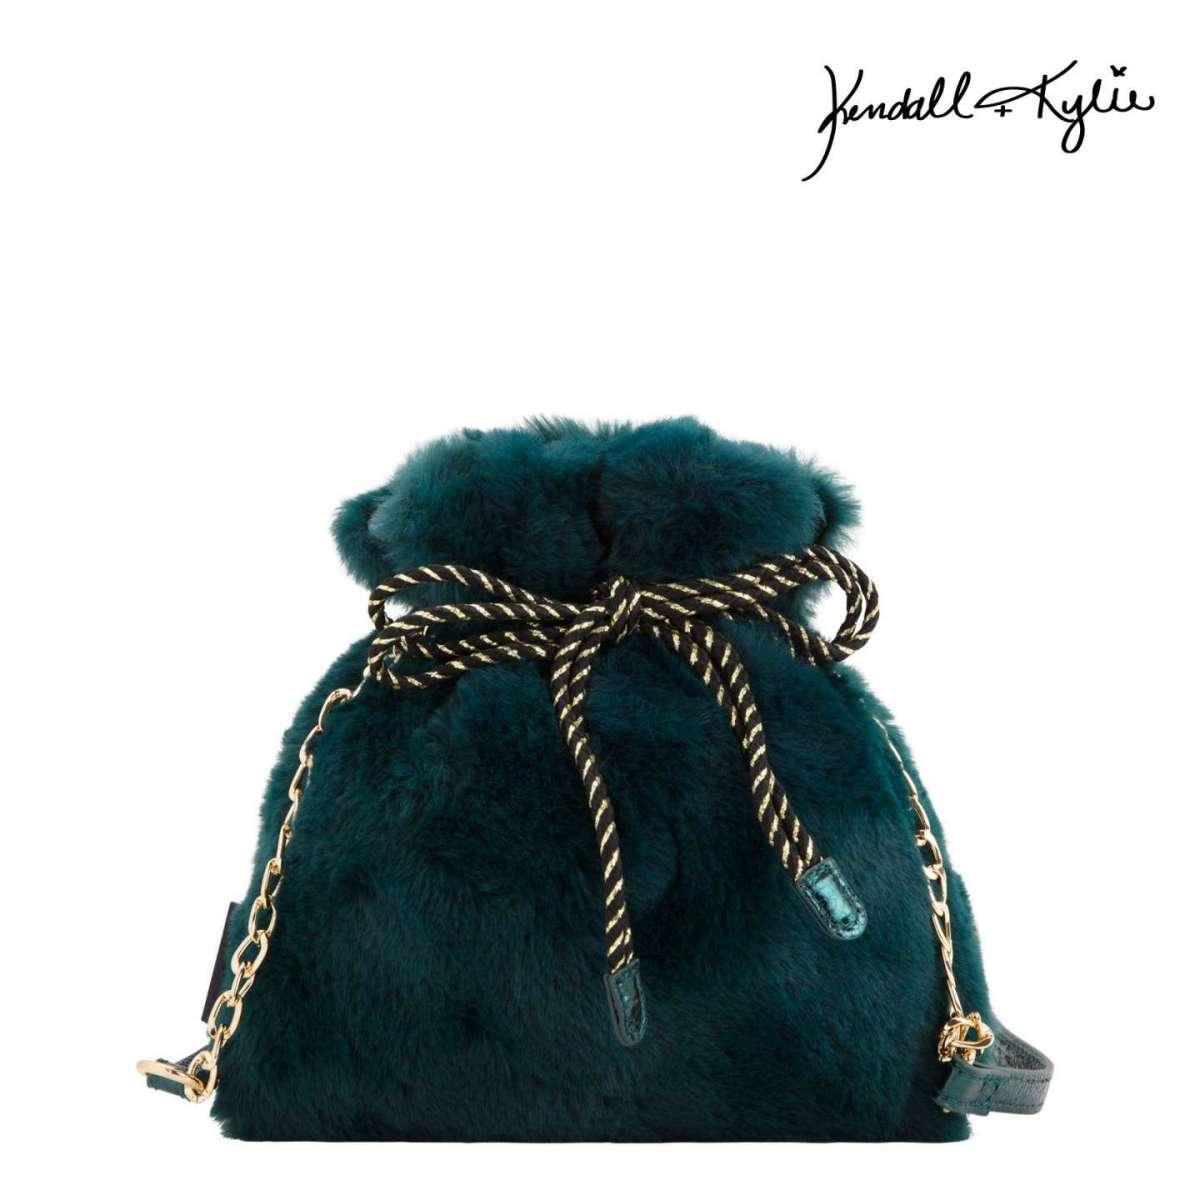 Borsa a secchiello effetto pelliccia Kendall + Kylie for Carpisa a 29,95 euro